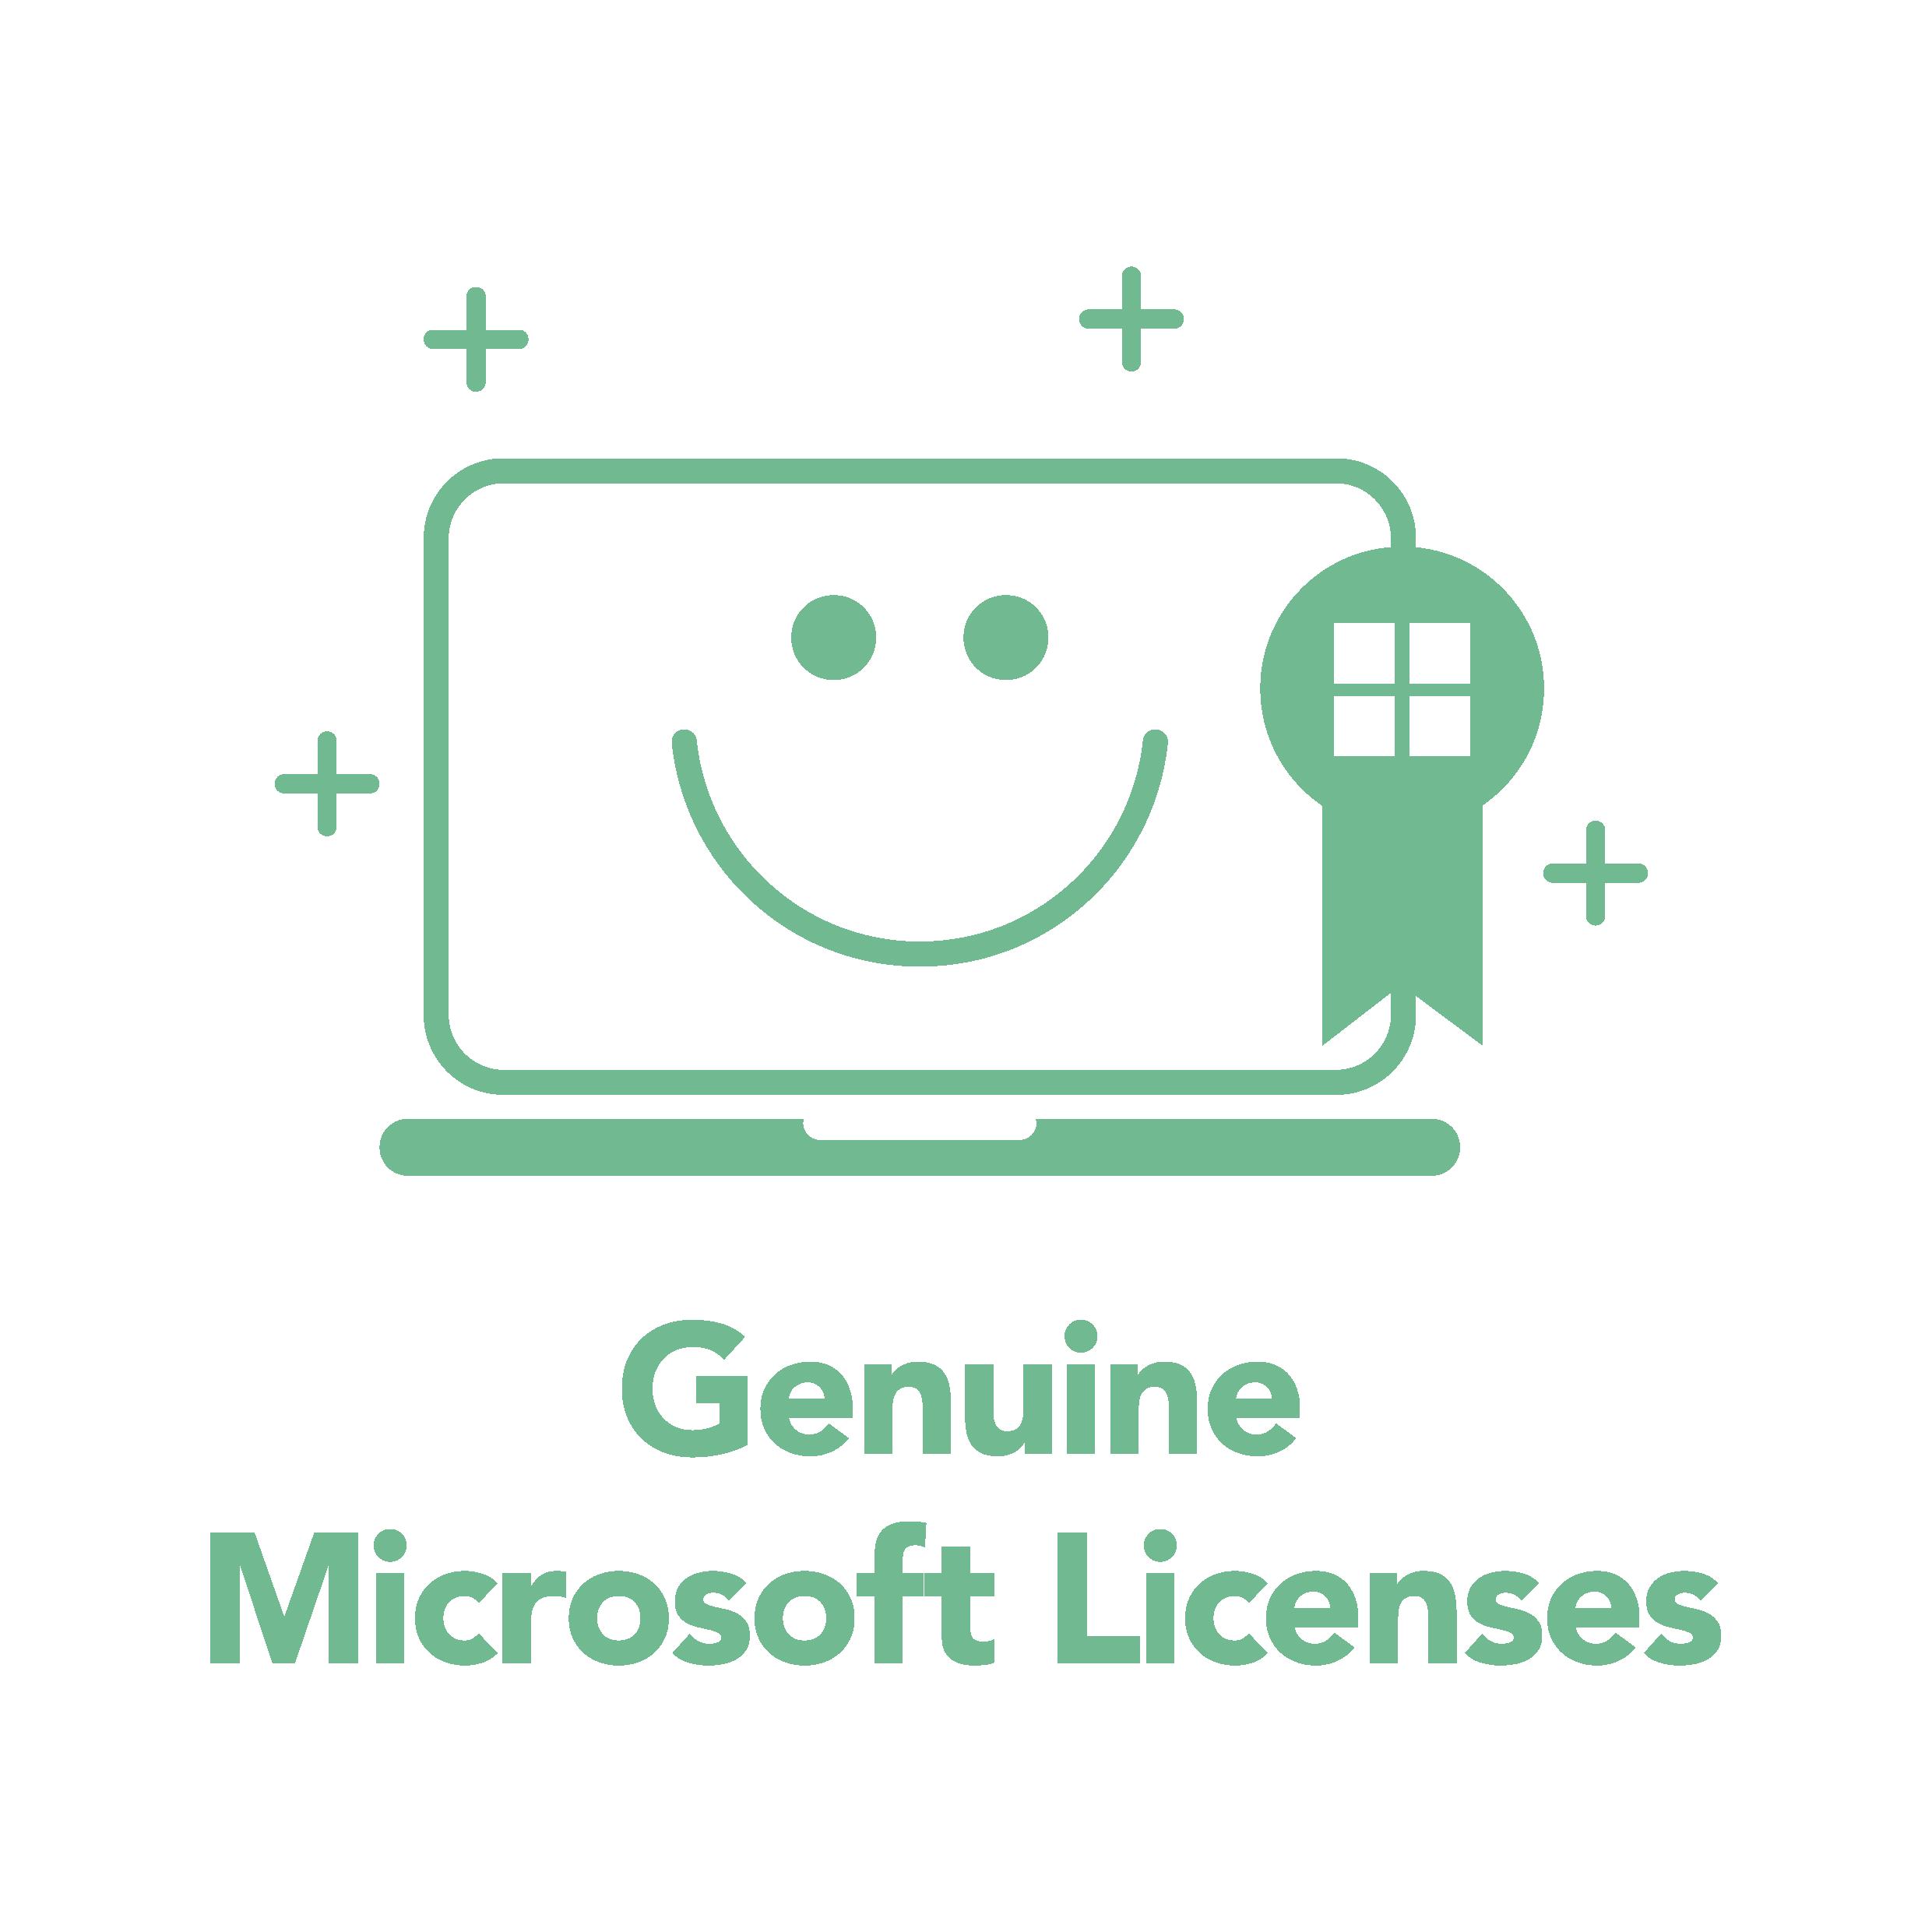 Genuine Microsoft Licenses